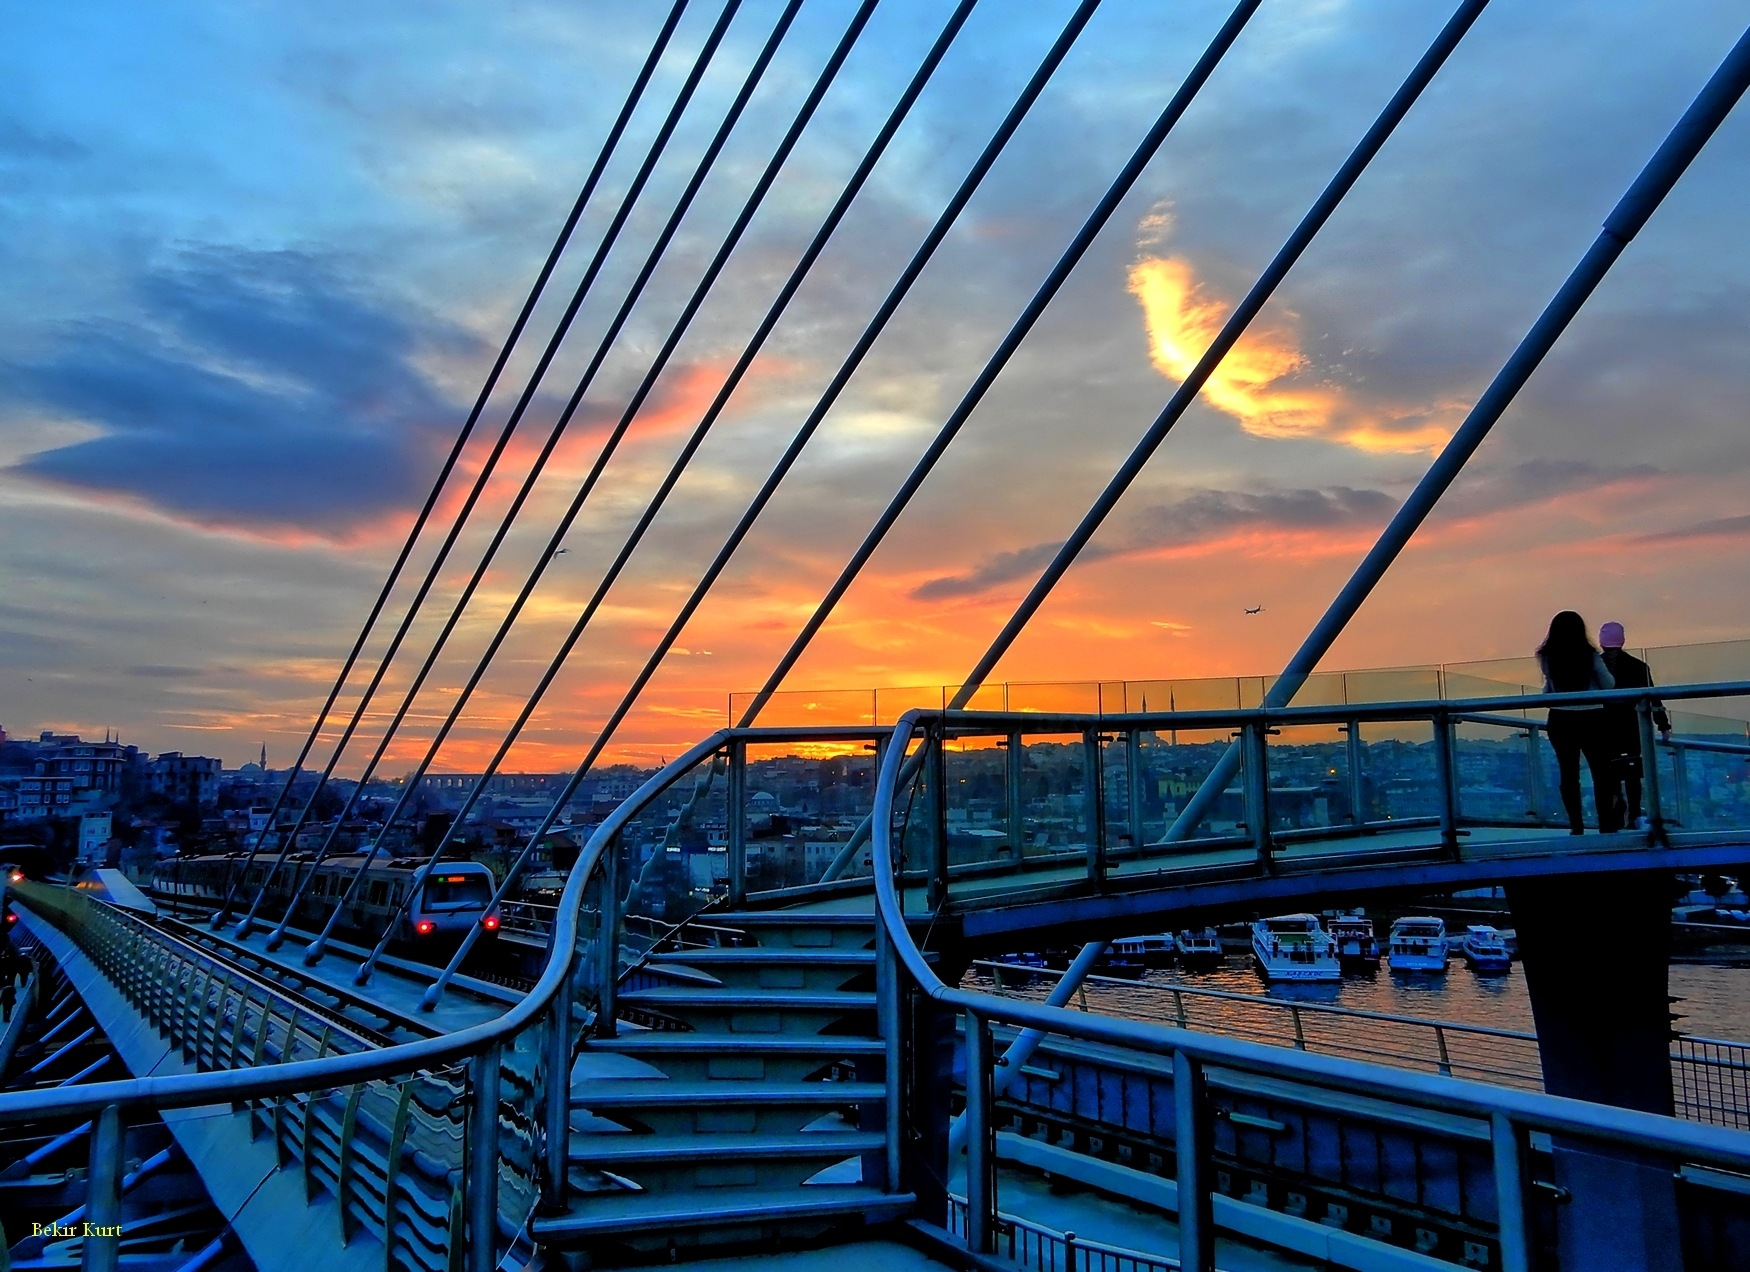 Sunset Over The Golden Horn Metro Bridge by Bekir Kurt